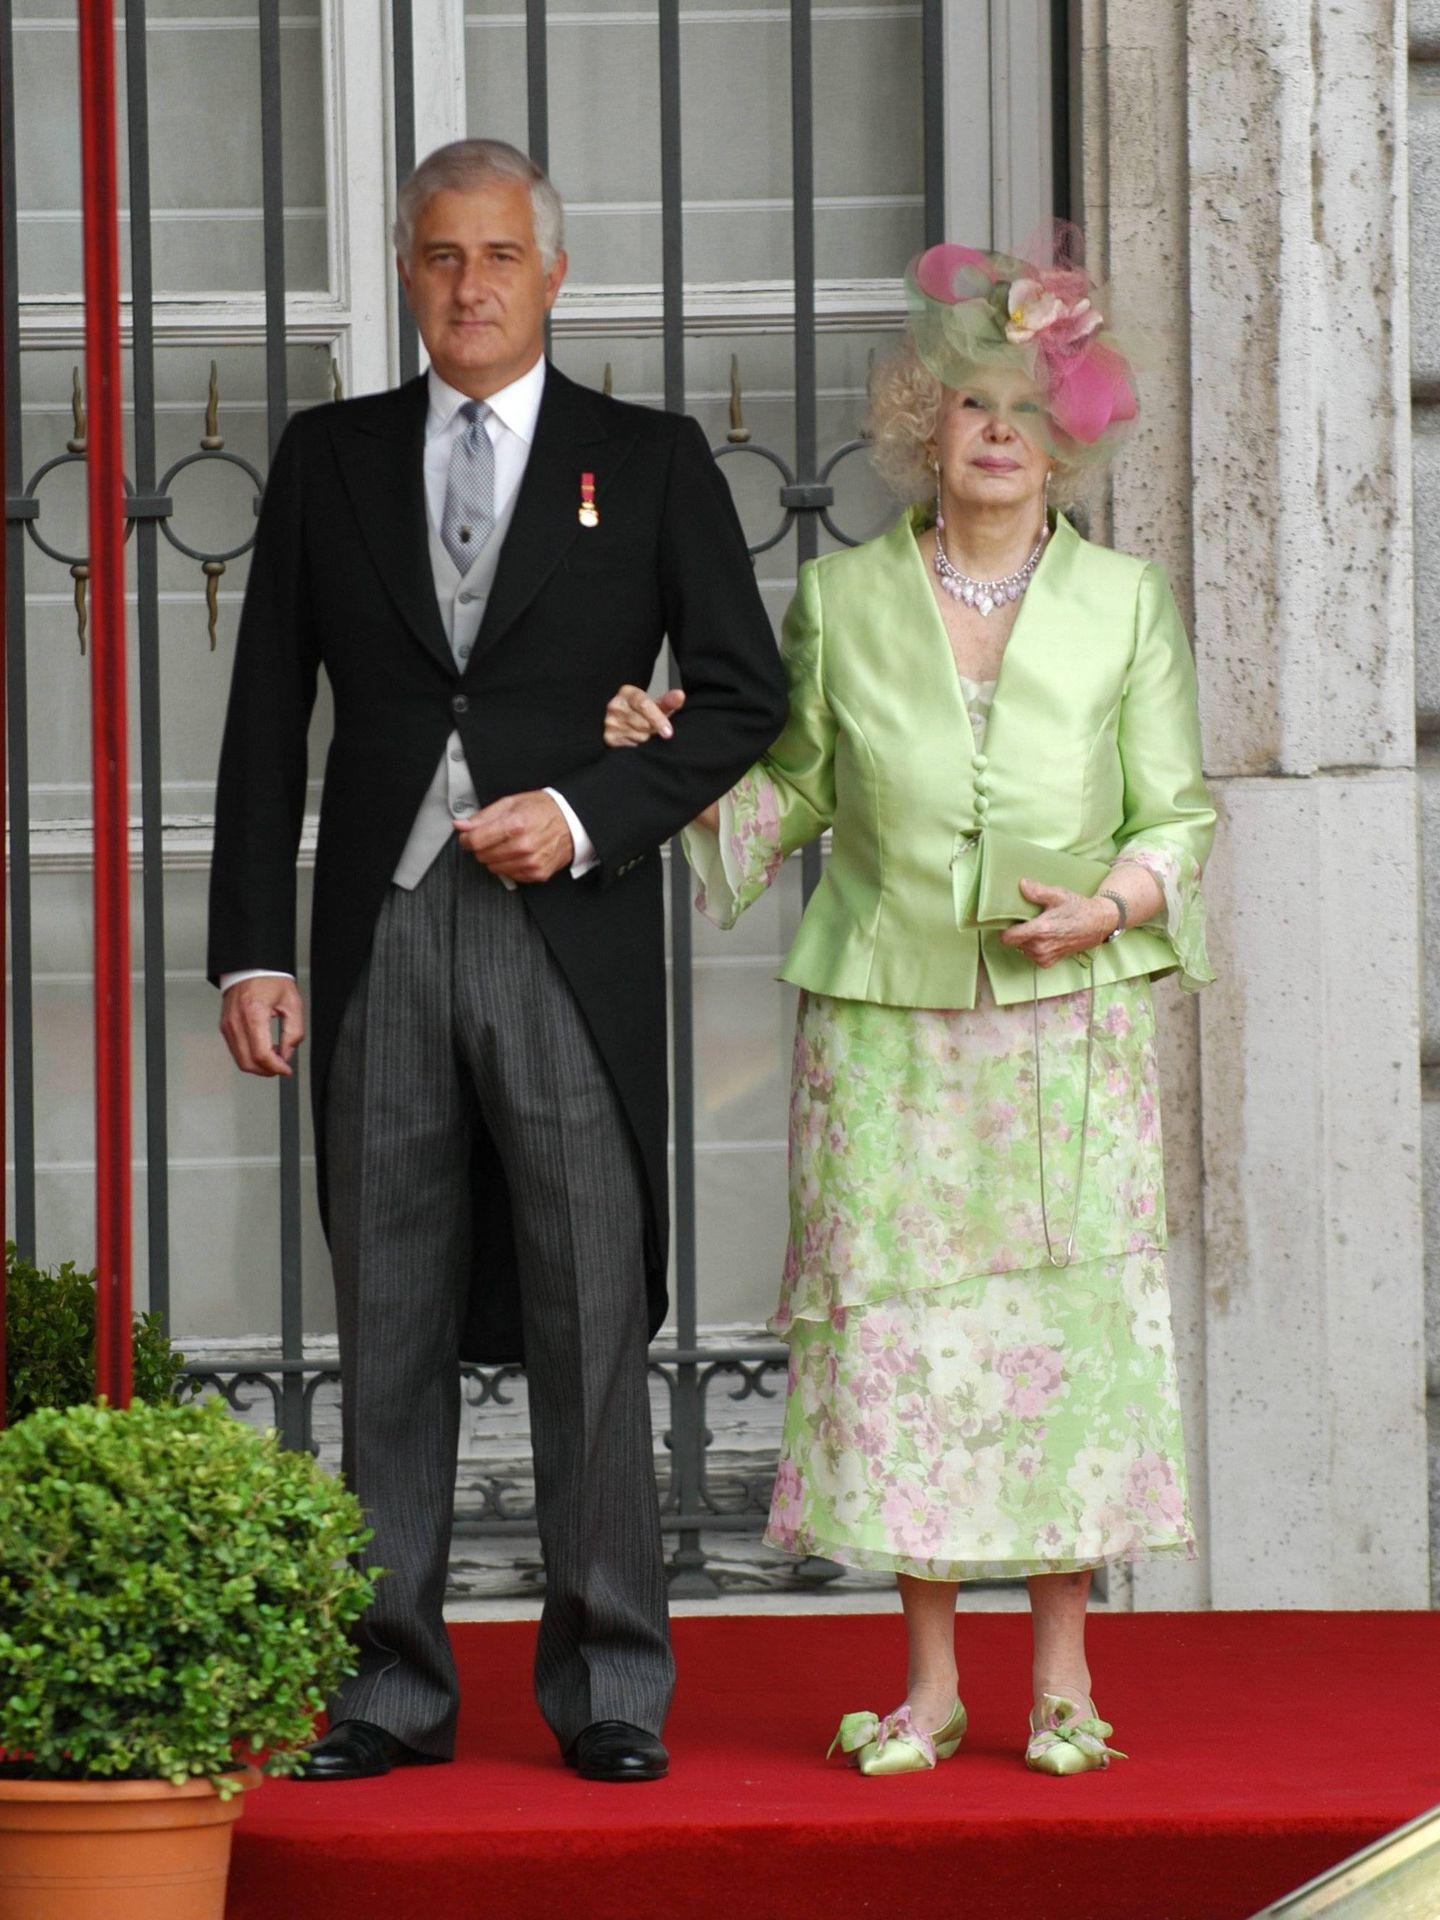 La duquesa de Alba, en la boda de Felipe VI y doña Letizia. (Cordon Press)